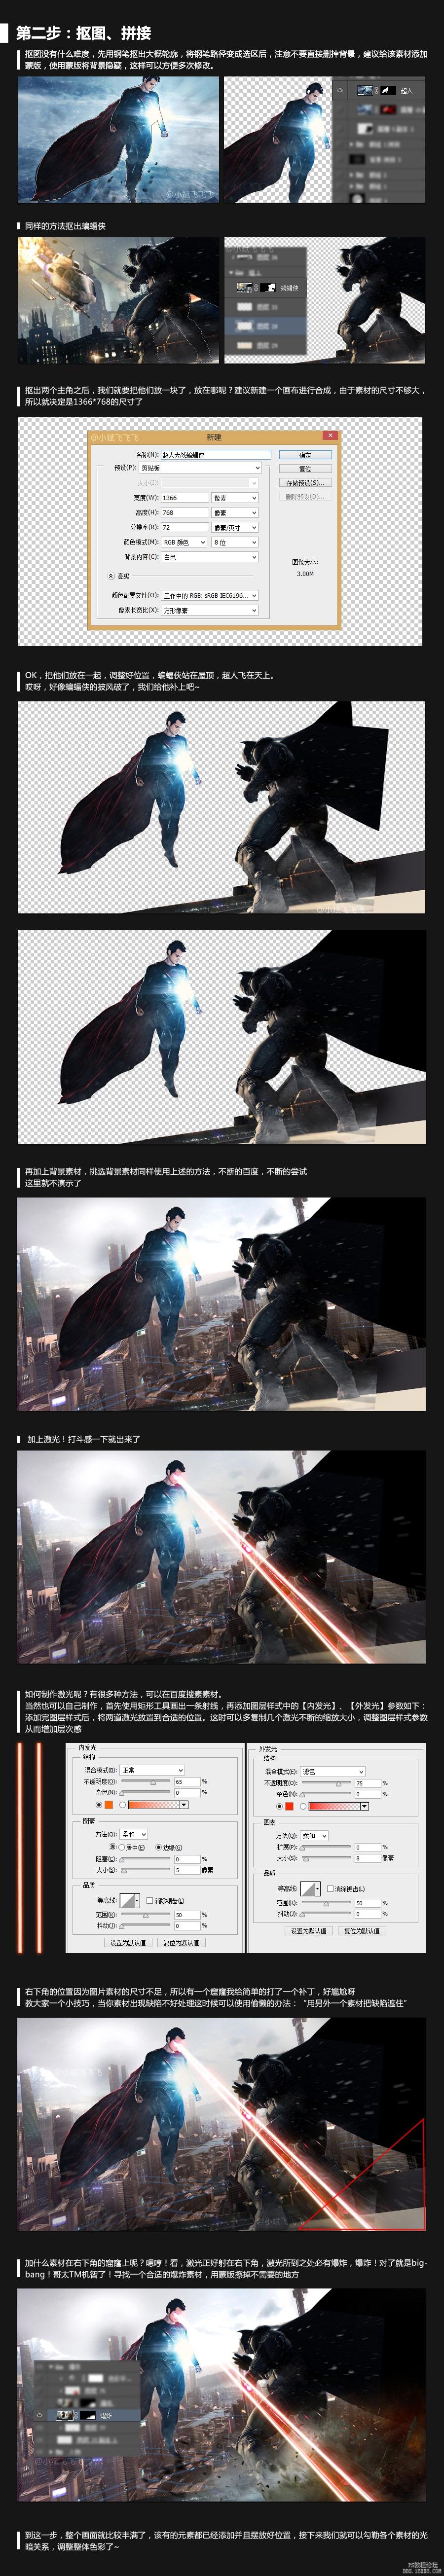 PS合成超人大戰蝙蝠俠場景—超詳細教程_ps教程自學網_www.weebk.com.cn